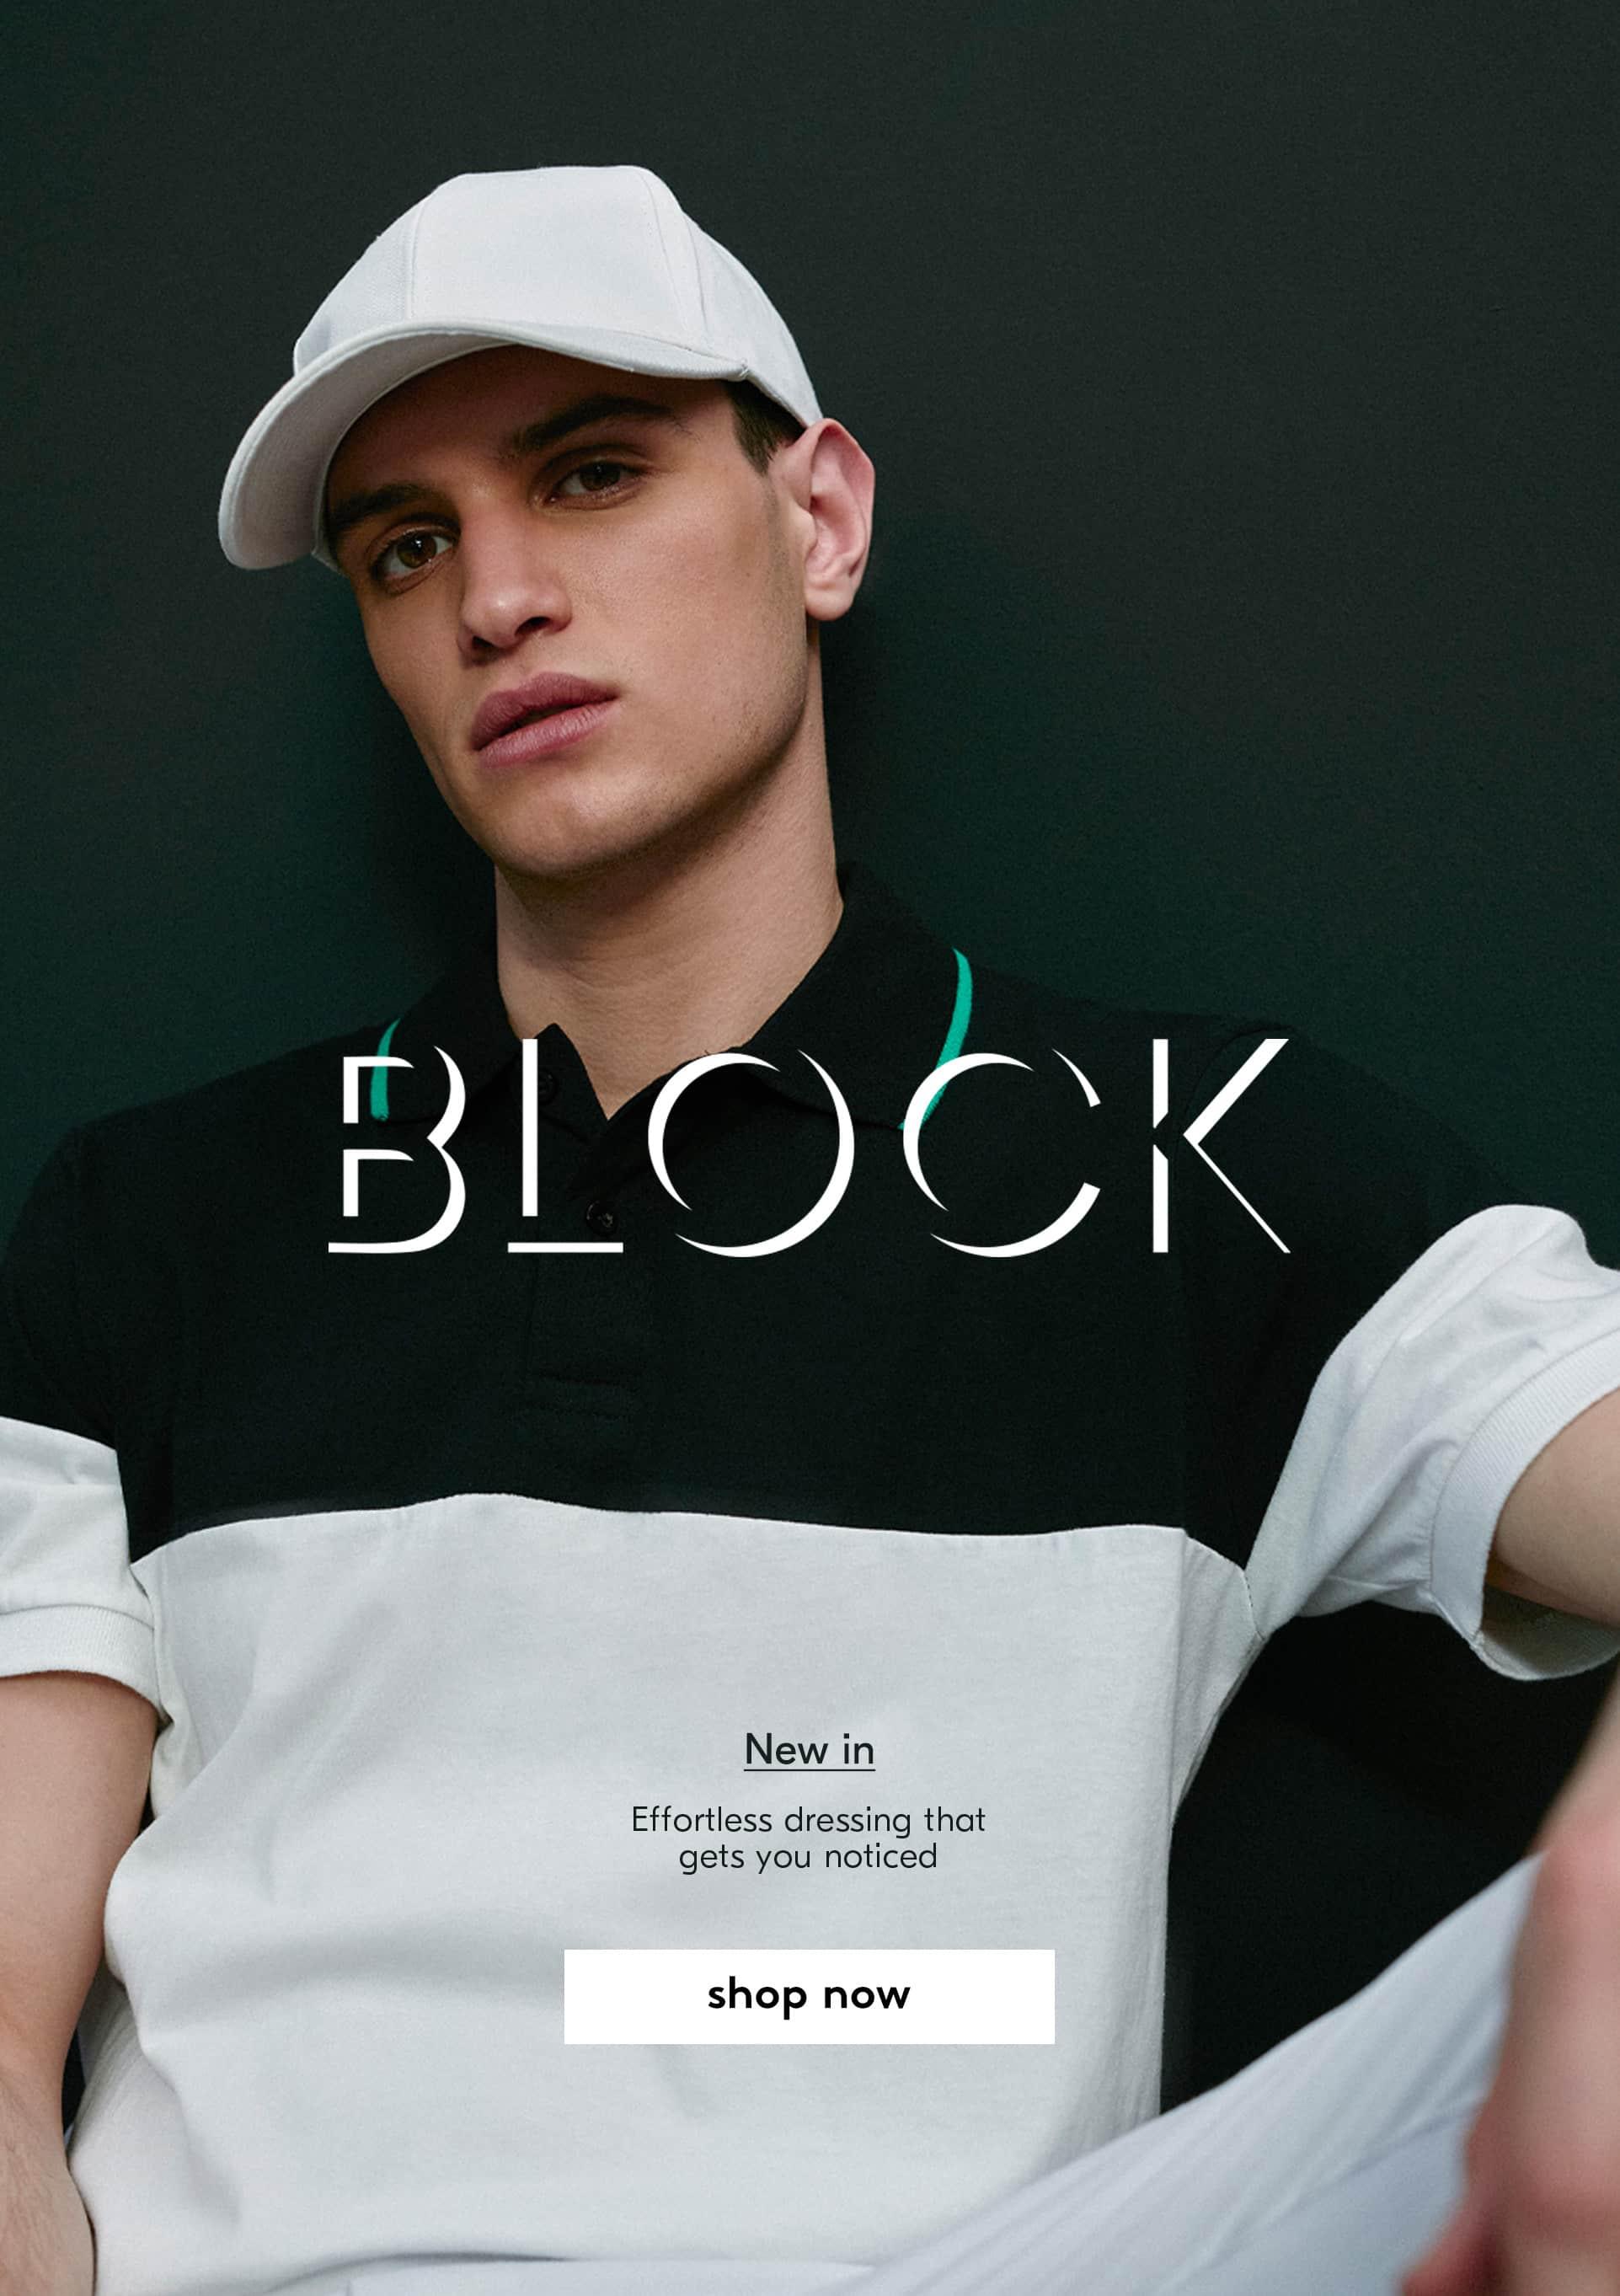 BLOCK - NEW IN